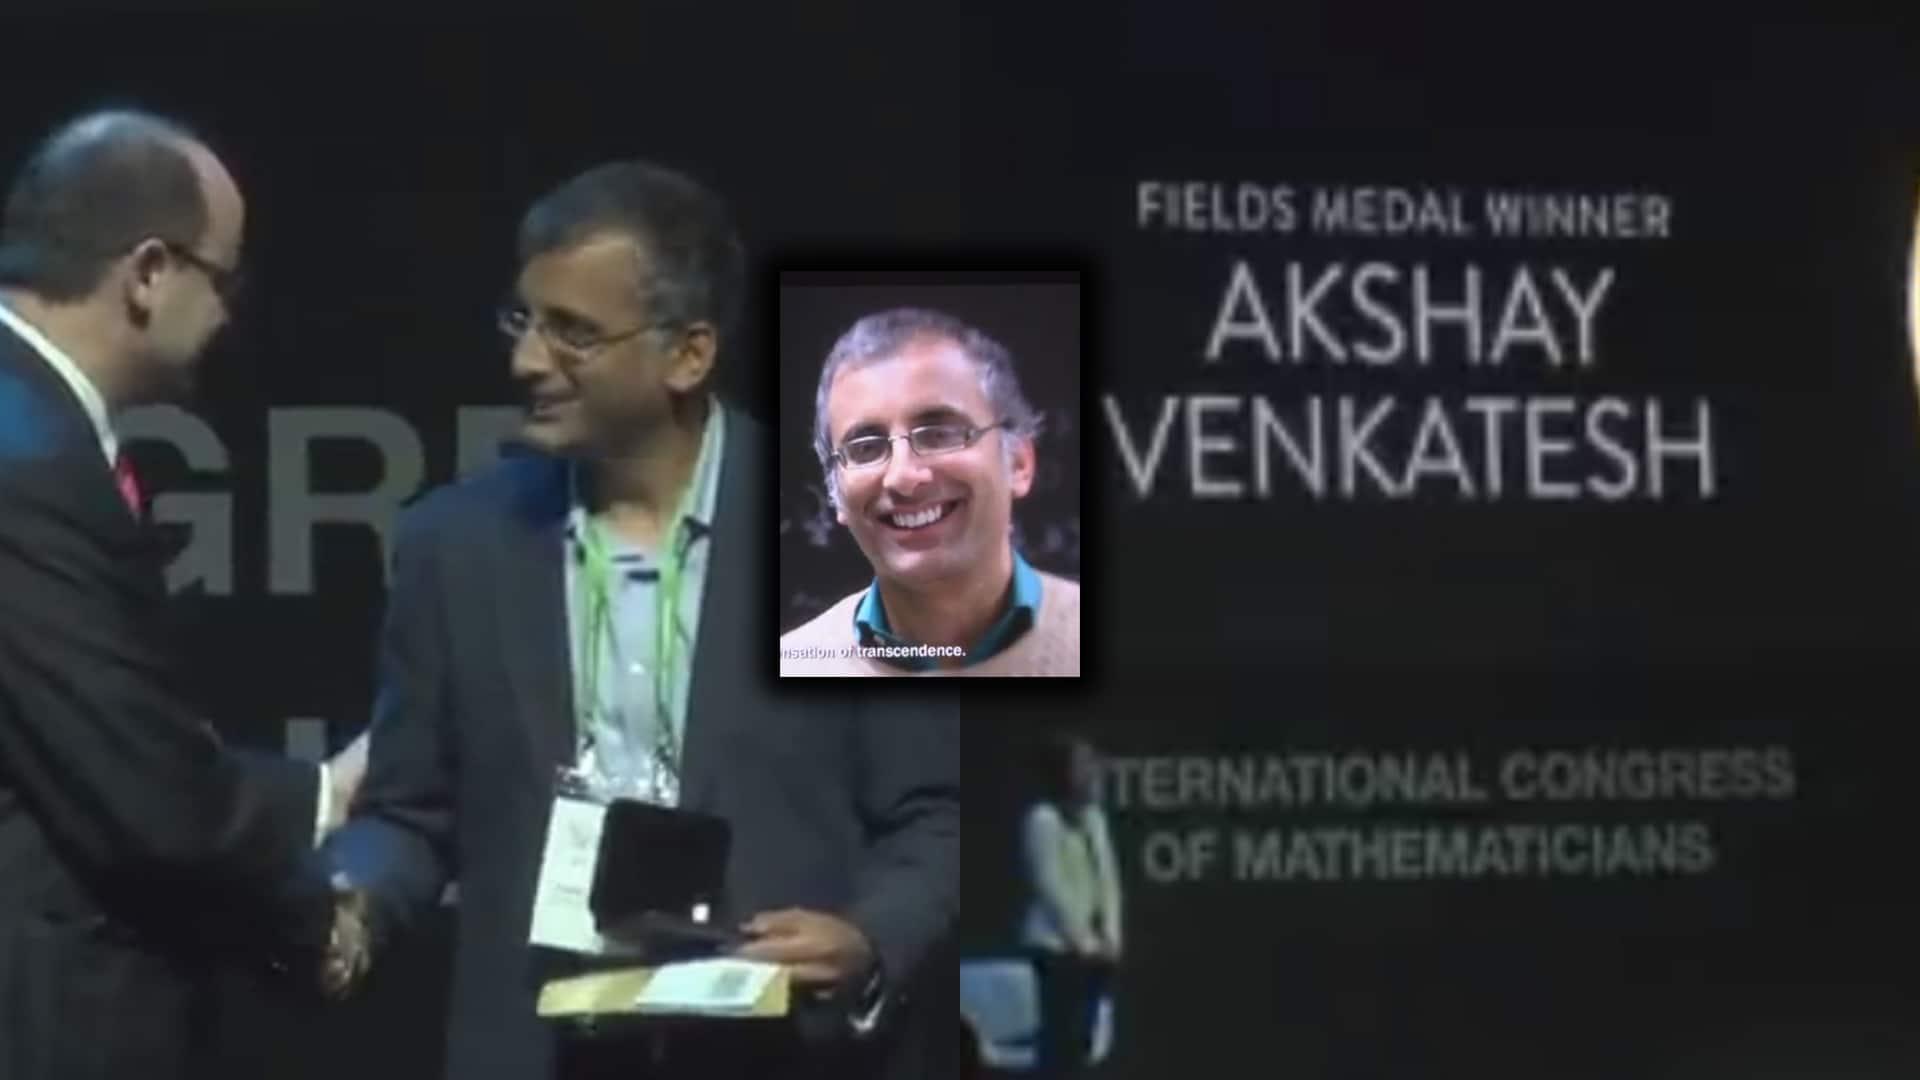 Indian-origin mathematician Akshay Venkatesh wins prestigious Fields medal, 'Nobel prize for Maths'